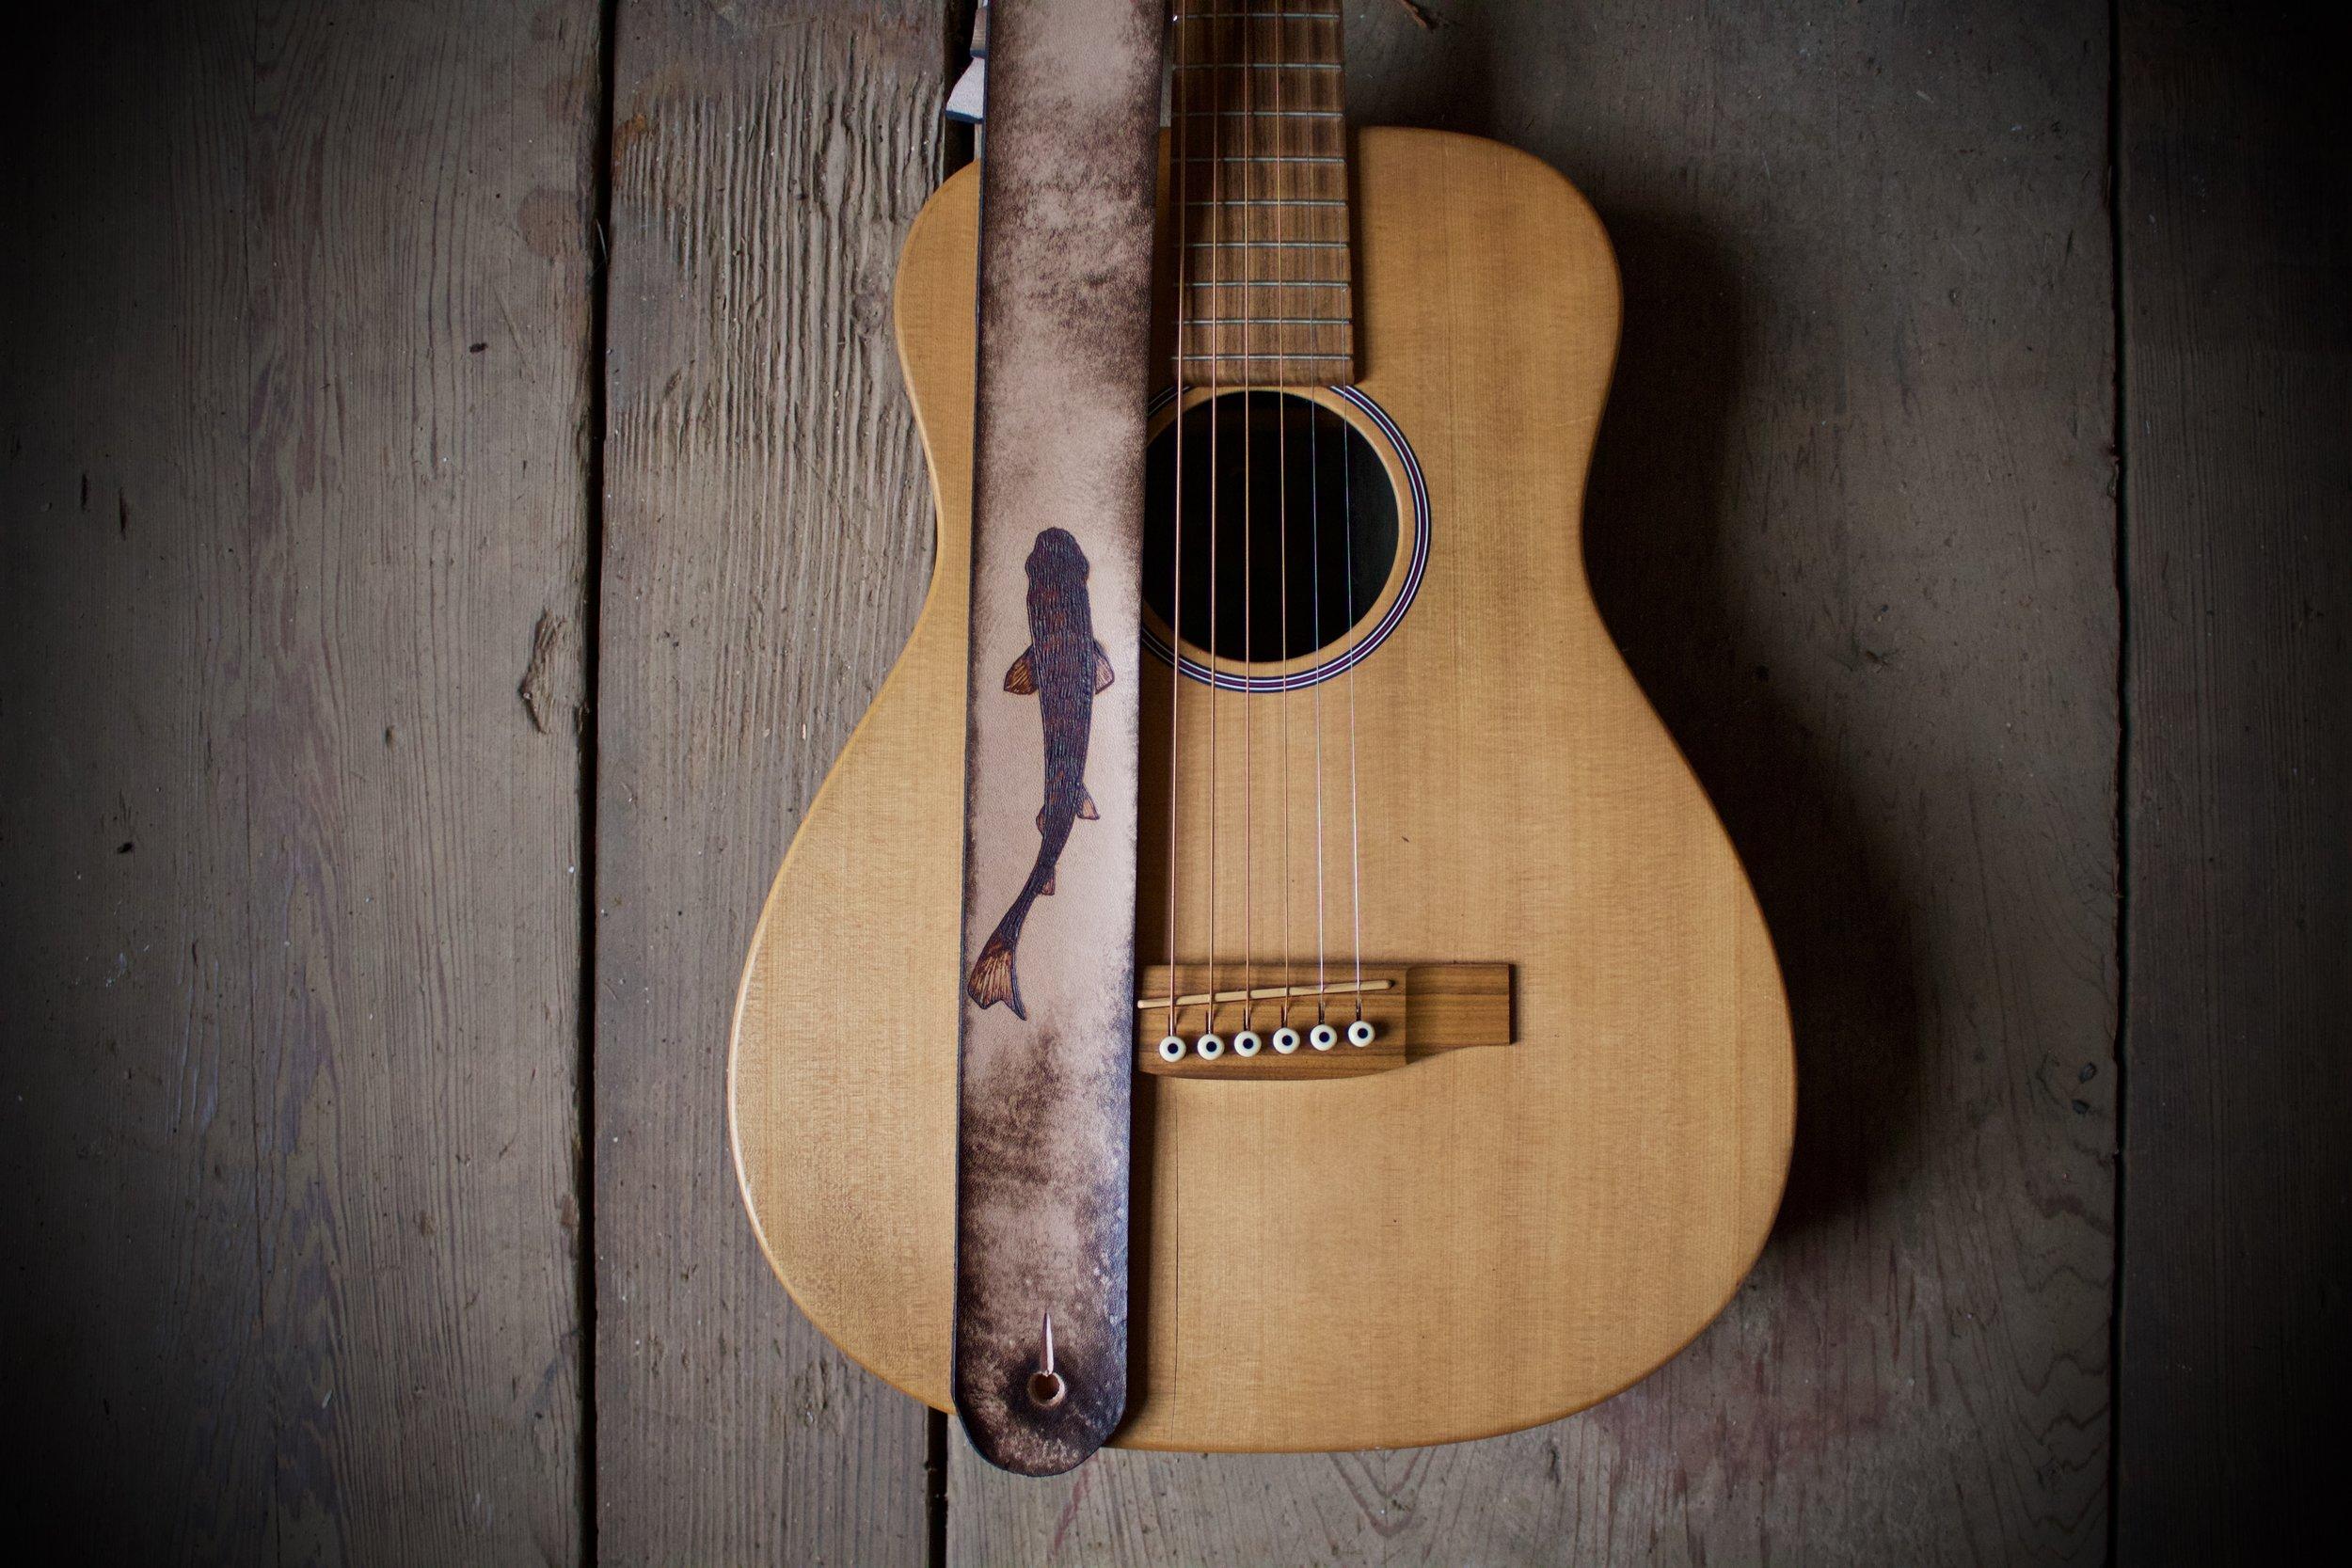 Koi fish guitar strap